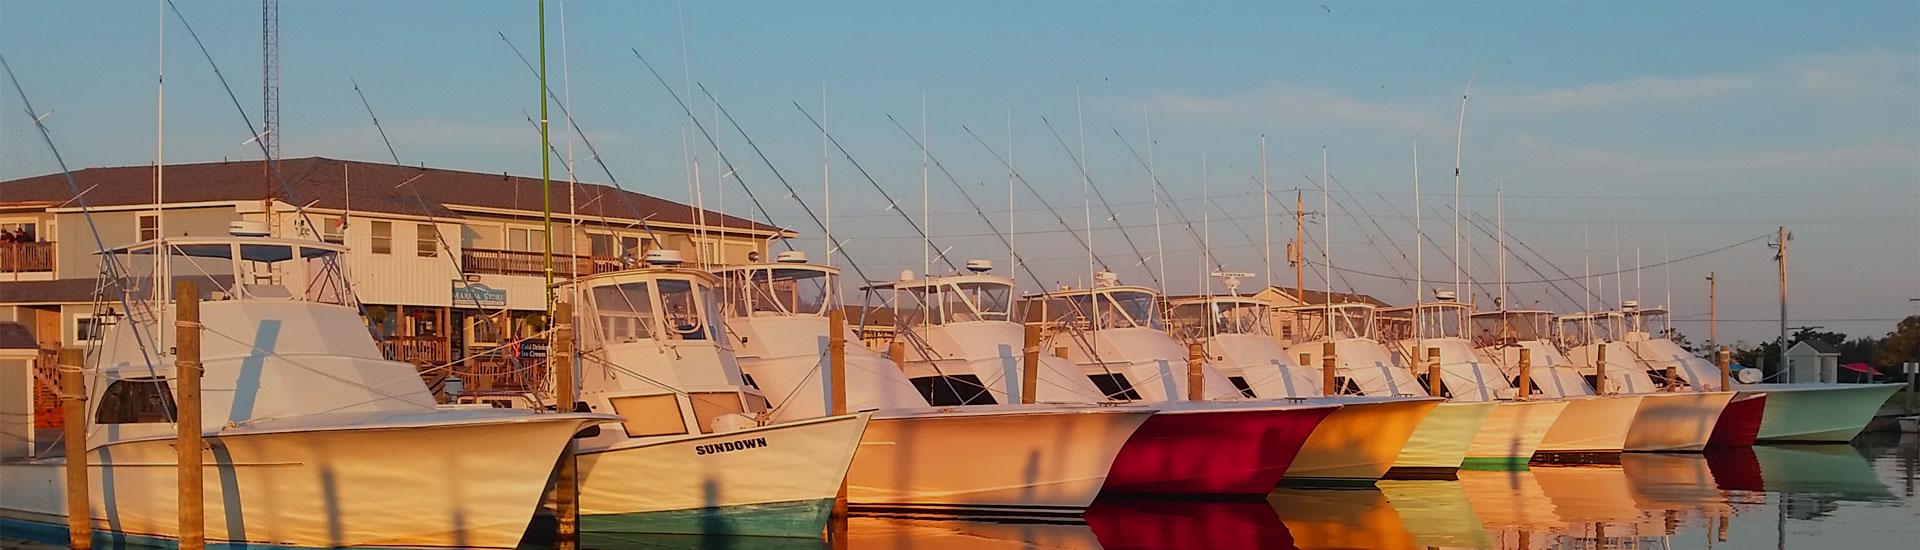 Fishing status local fishing forecast reports spots for Local fishing forecast